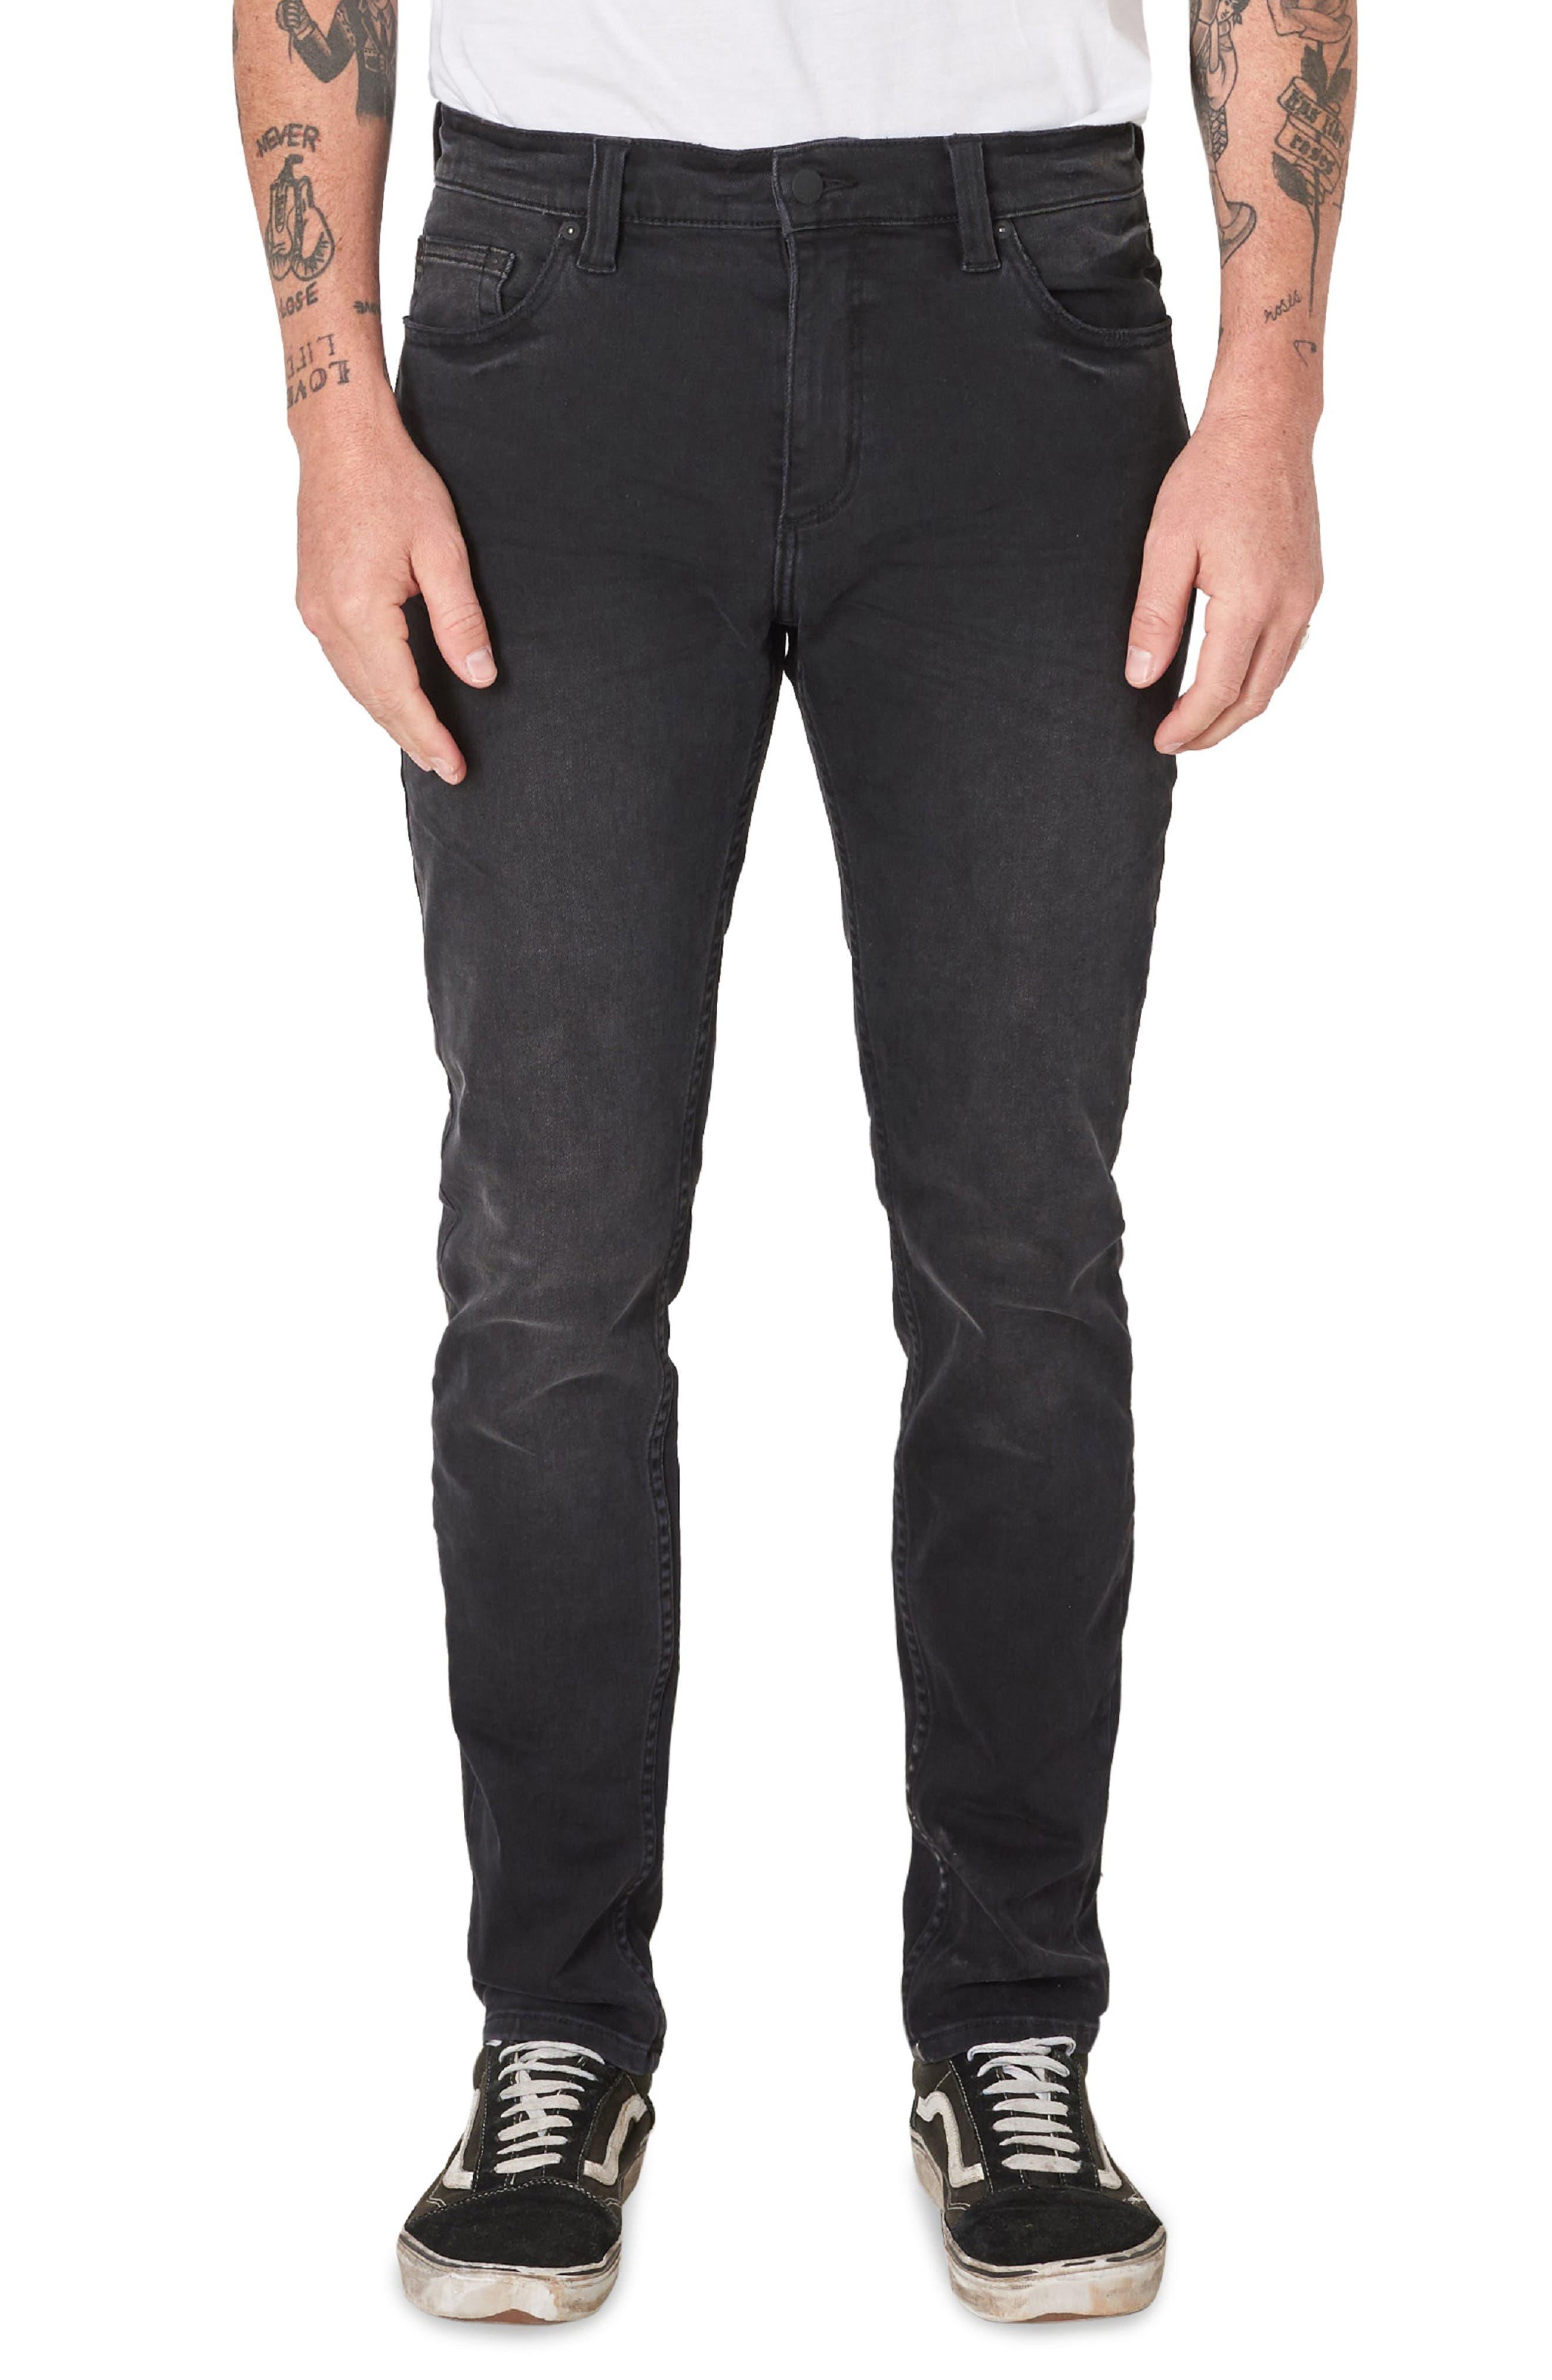 Stinger Skinny Fit Jeans,                             Main thumbnail 1, color,                             BLACK CAT